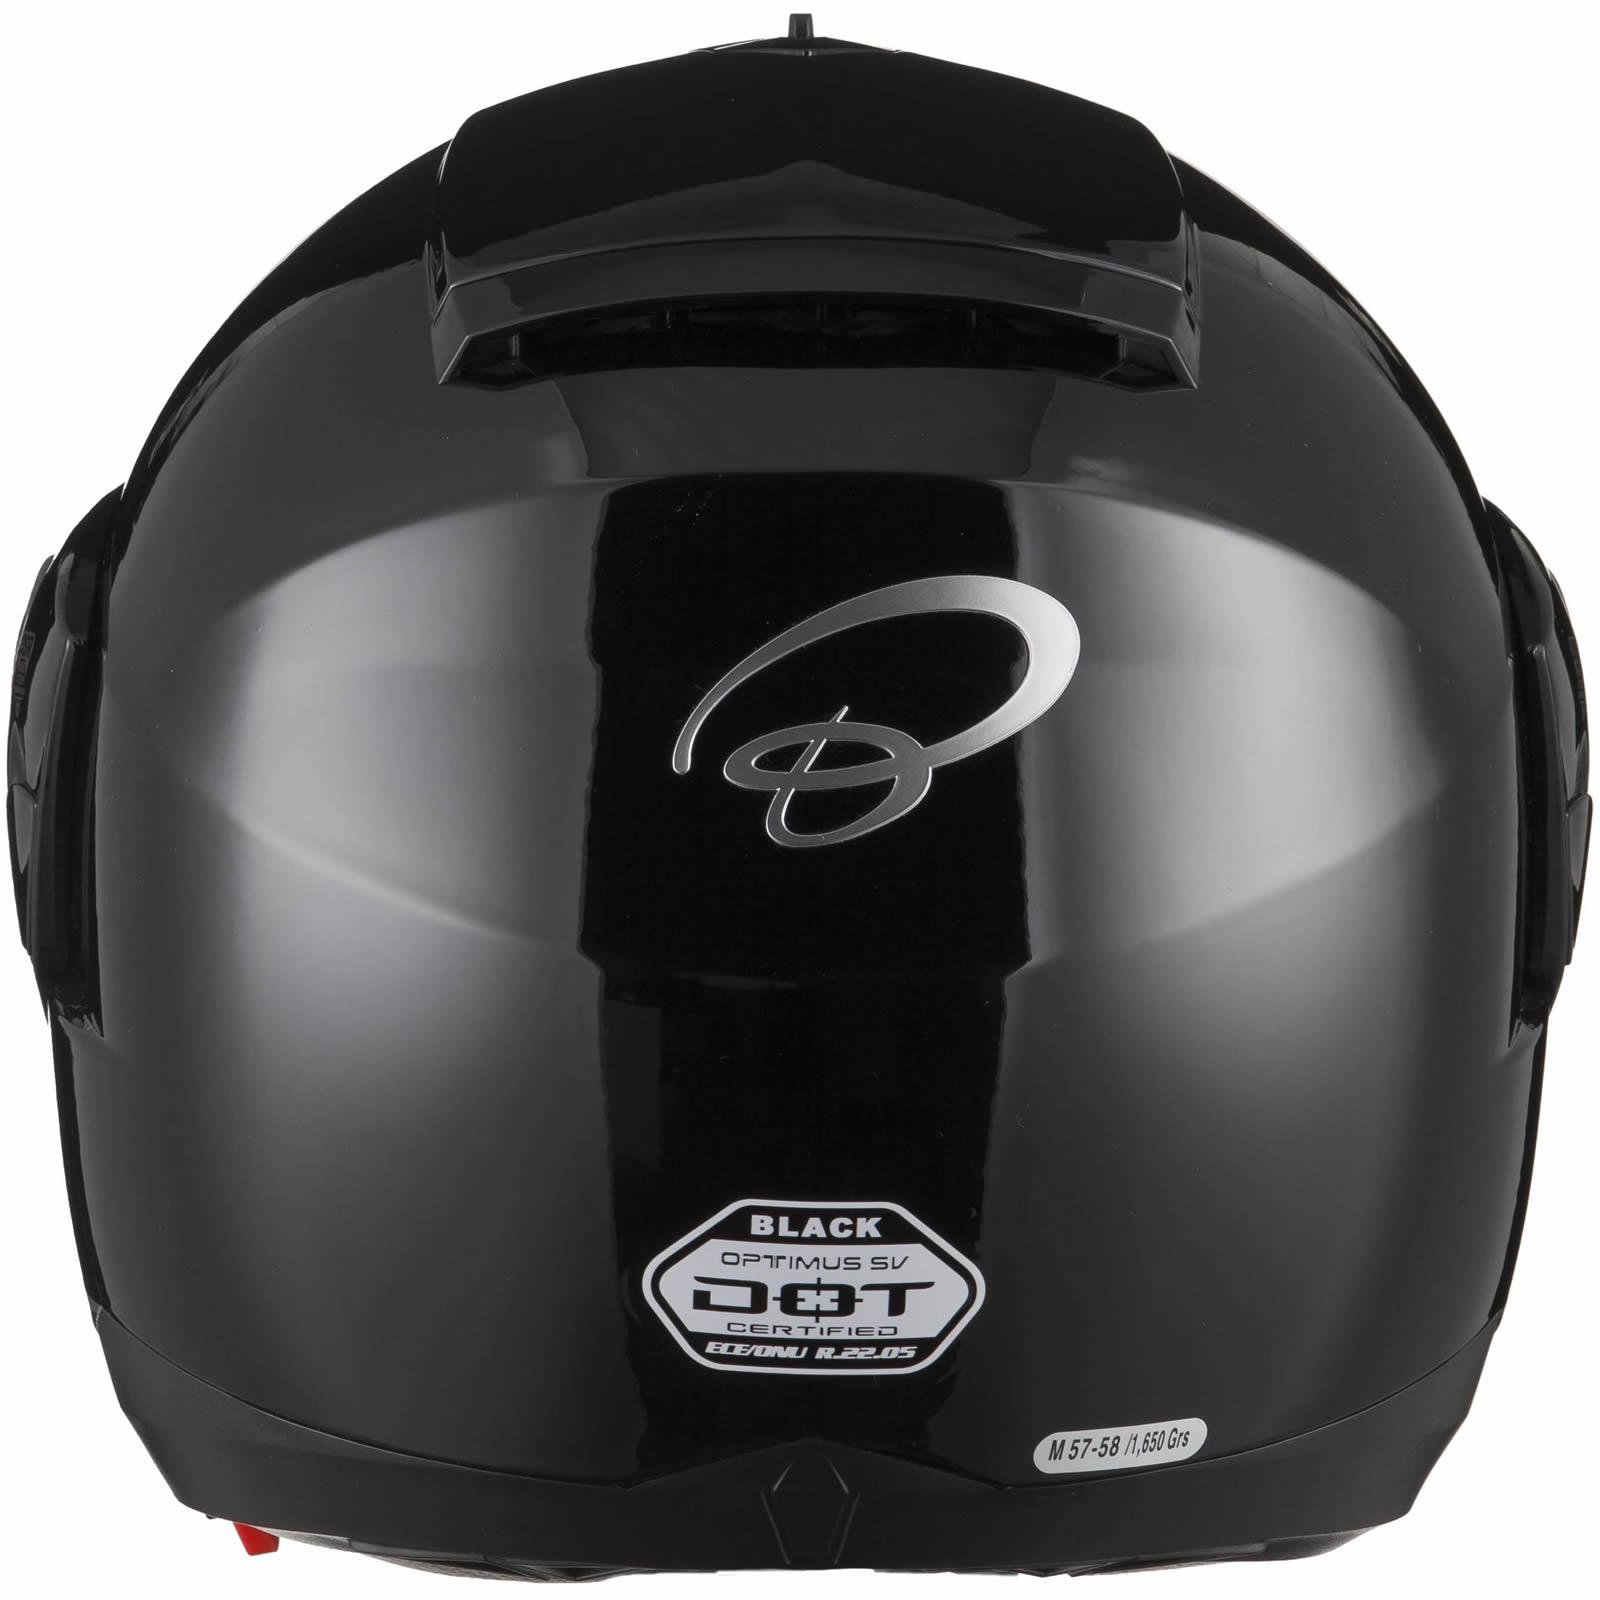 Black-Optimus-SV-Max-Vision-Flip-Up-Front-Motorcycle-Helmet-Pinlock-Ready-Visor thumbnail 16